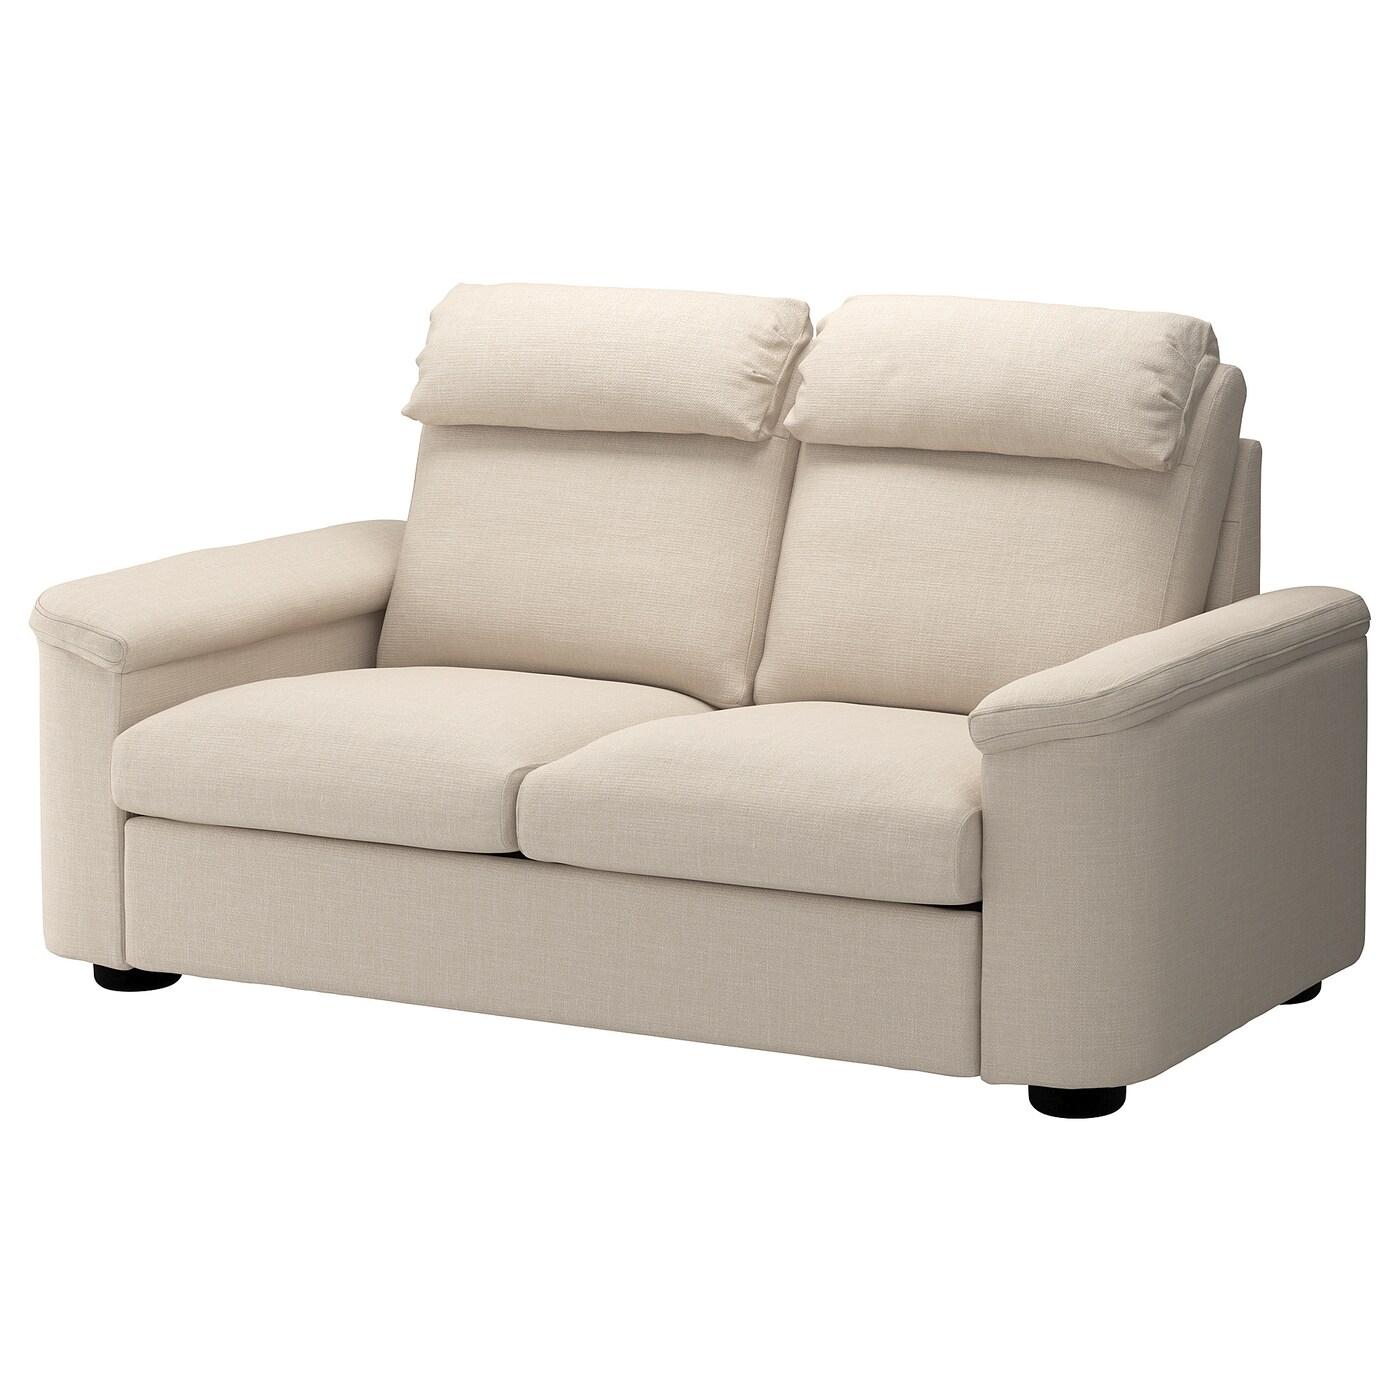 IKEA LIDHULT Sofa 2-osobowa, Gassebol jasnobeżowy